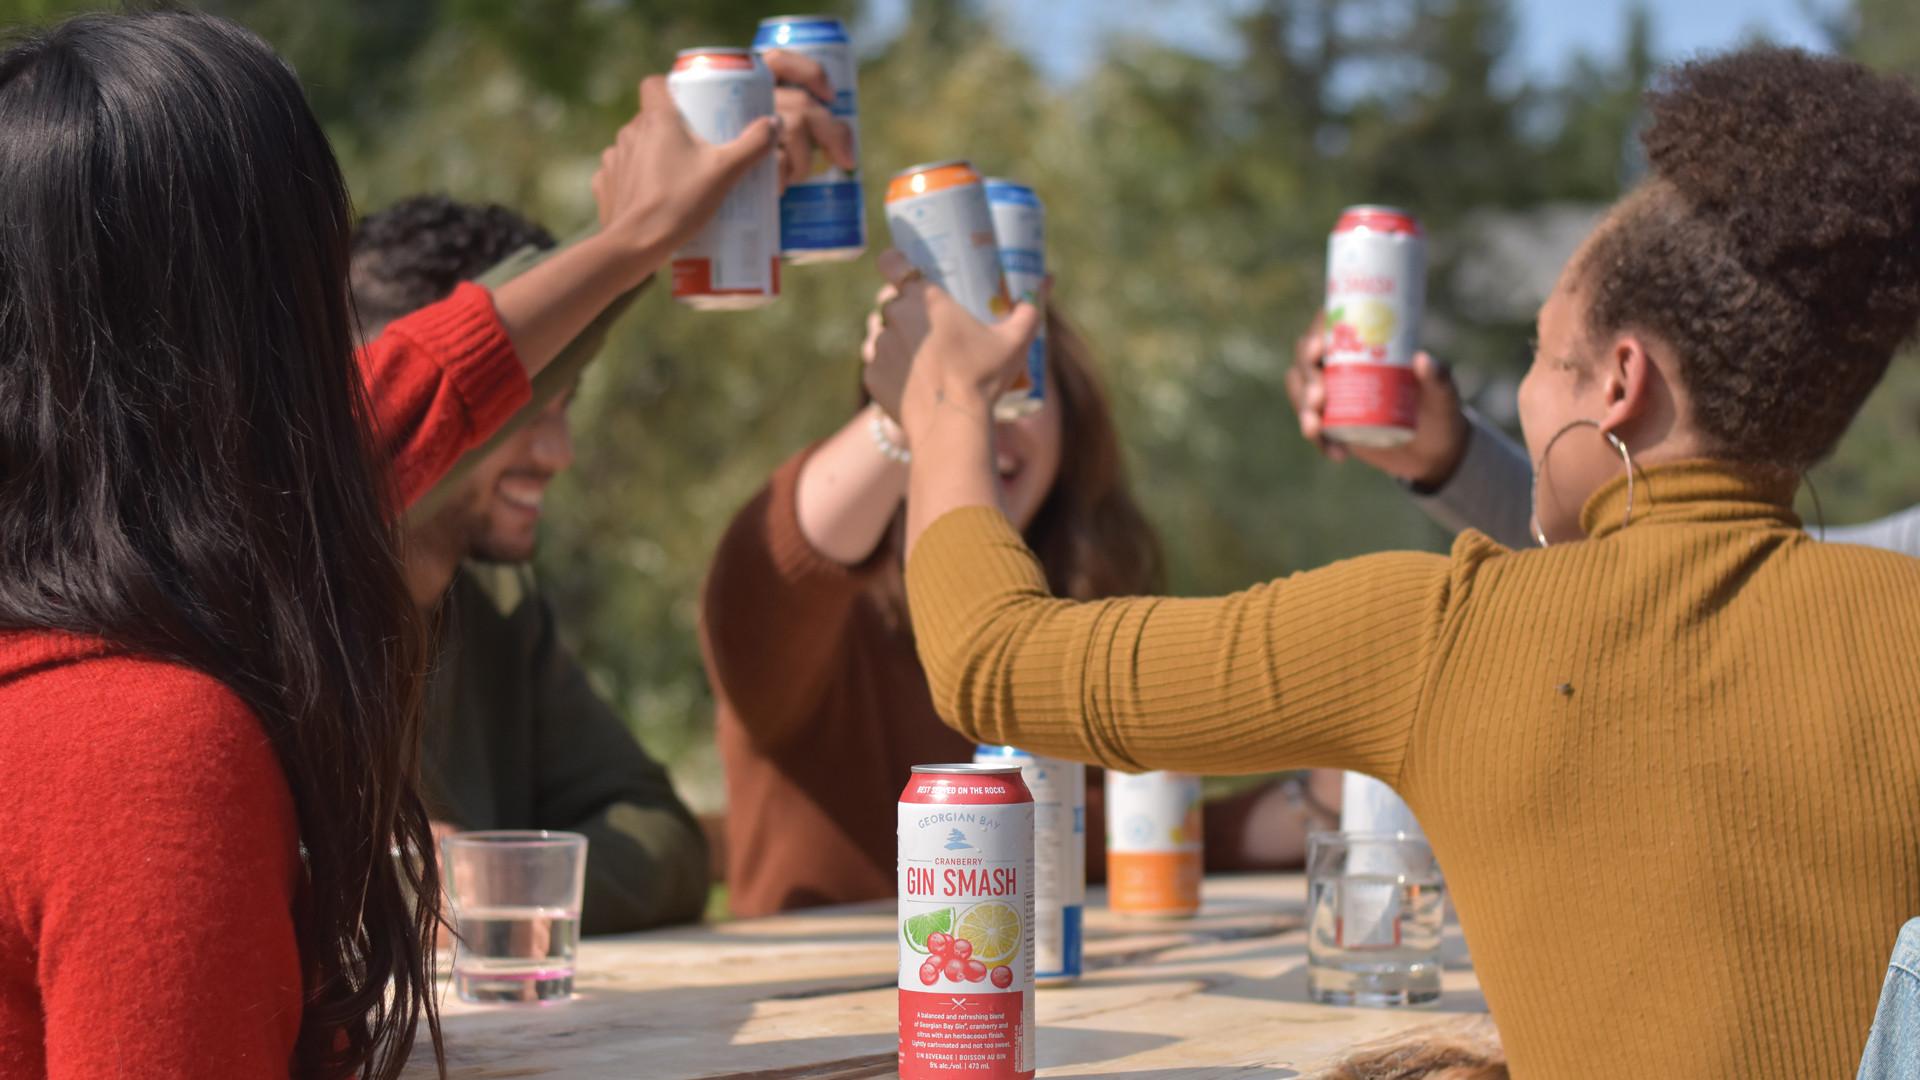 Win a smashing party pack from Georgian Bay Spirit Co. | Friends drinking Georgian Bay Gin Smashes